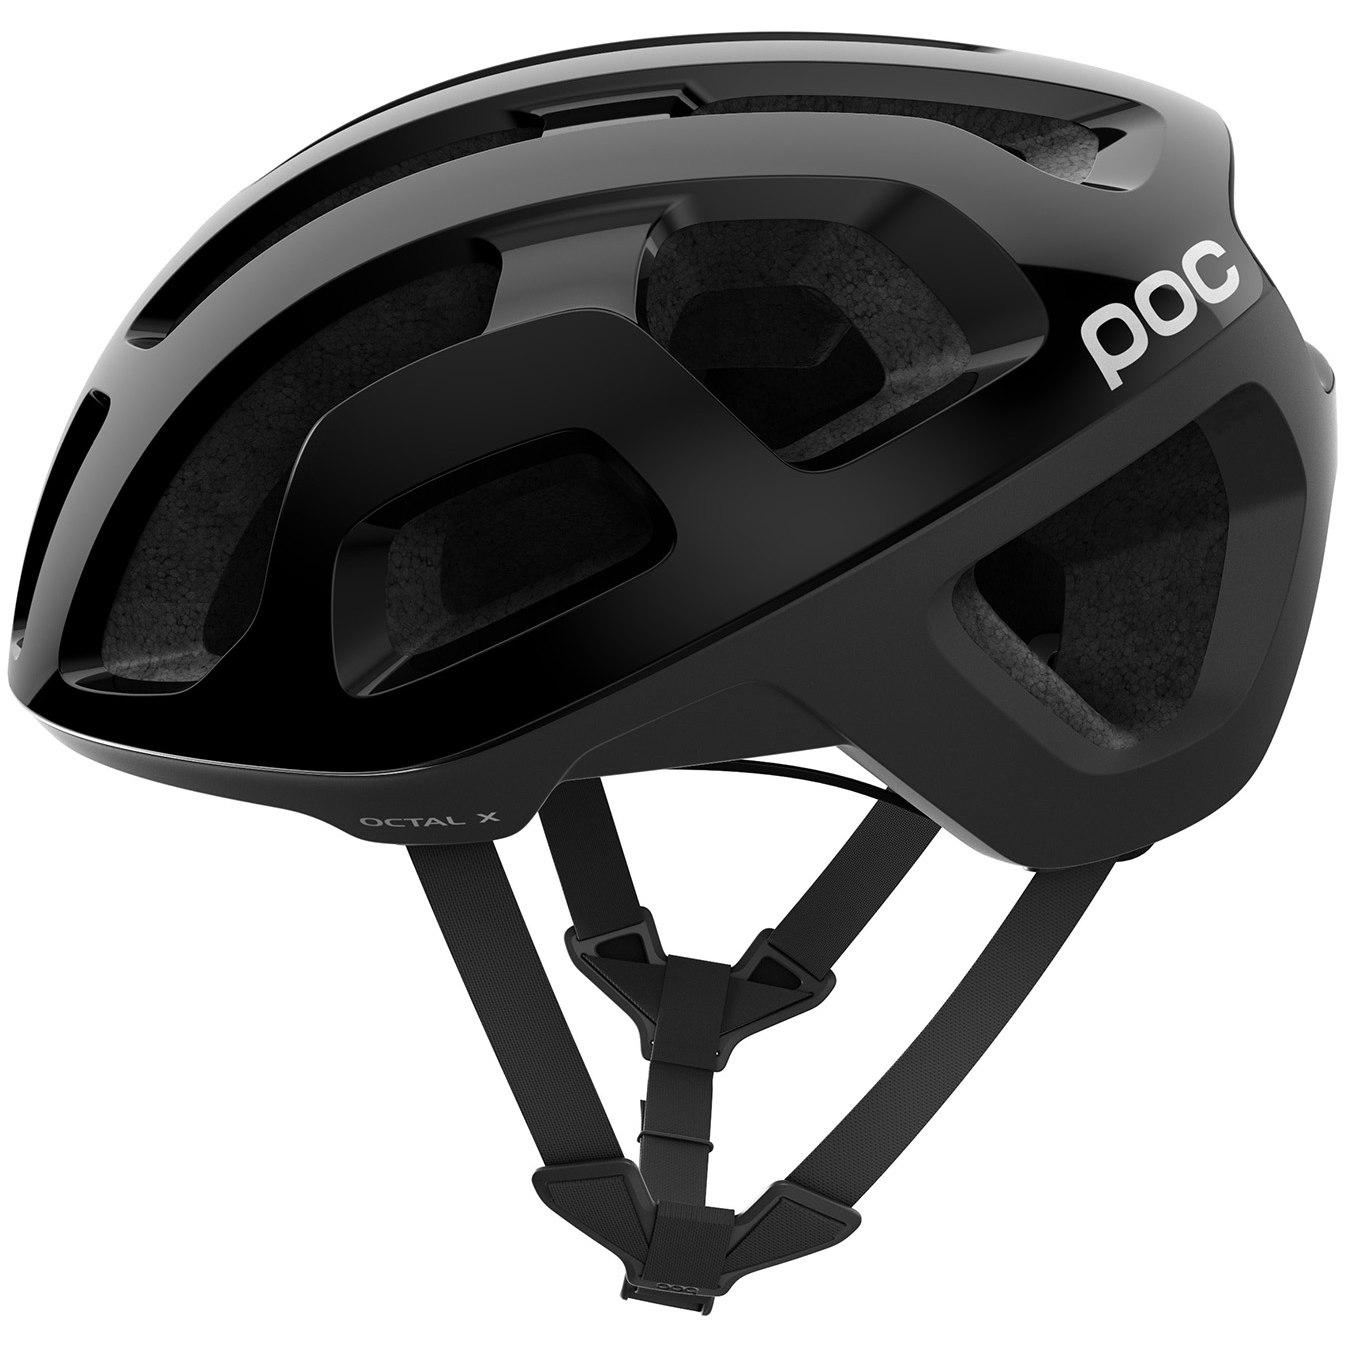 POC Octal X SPIN Helm - 1002 Uranium Black